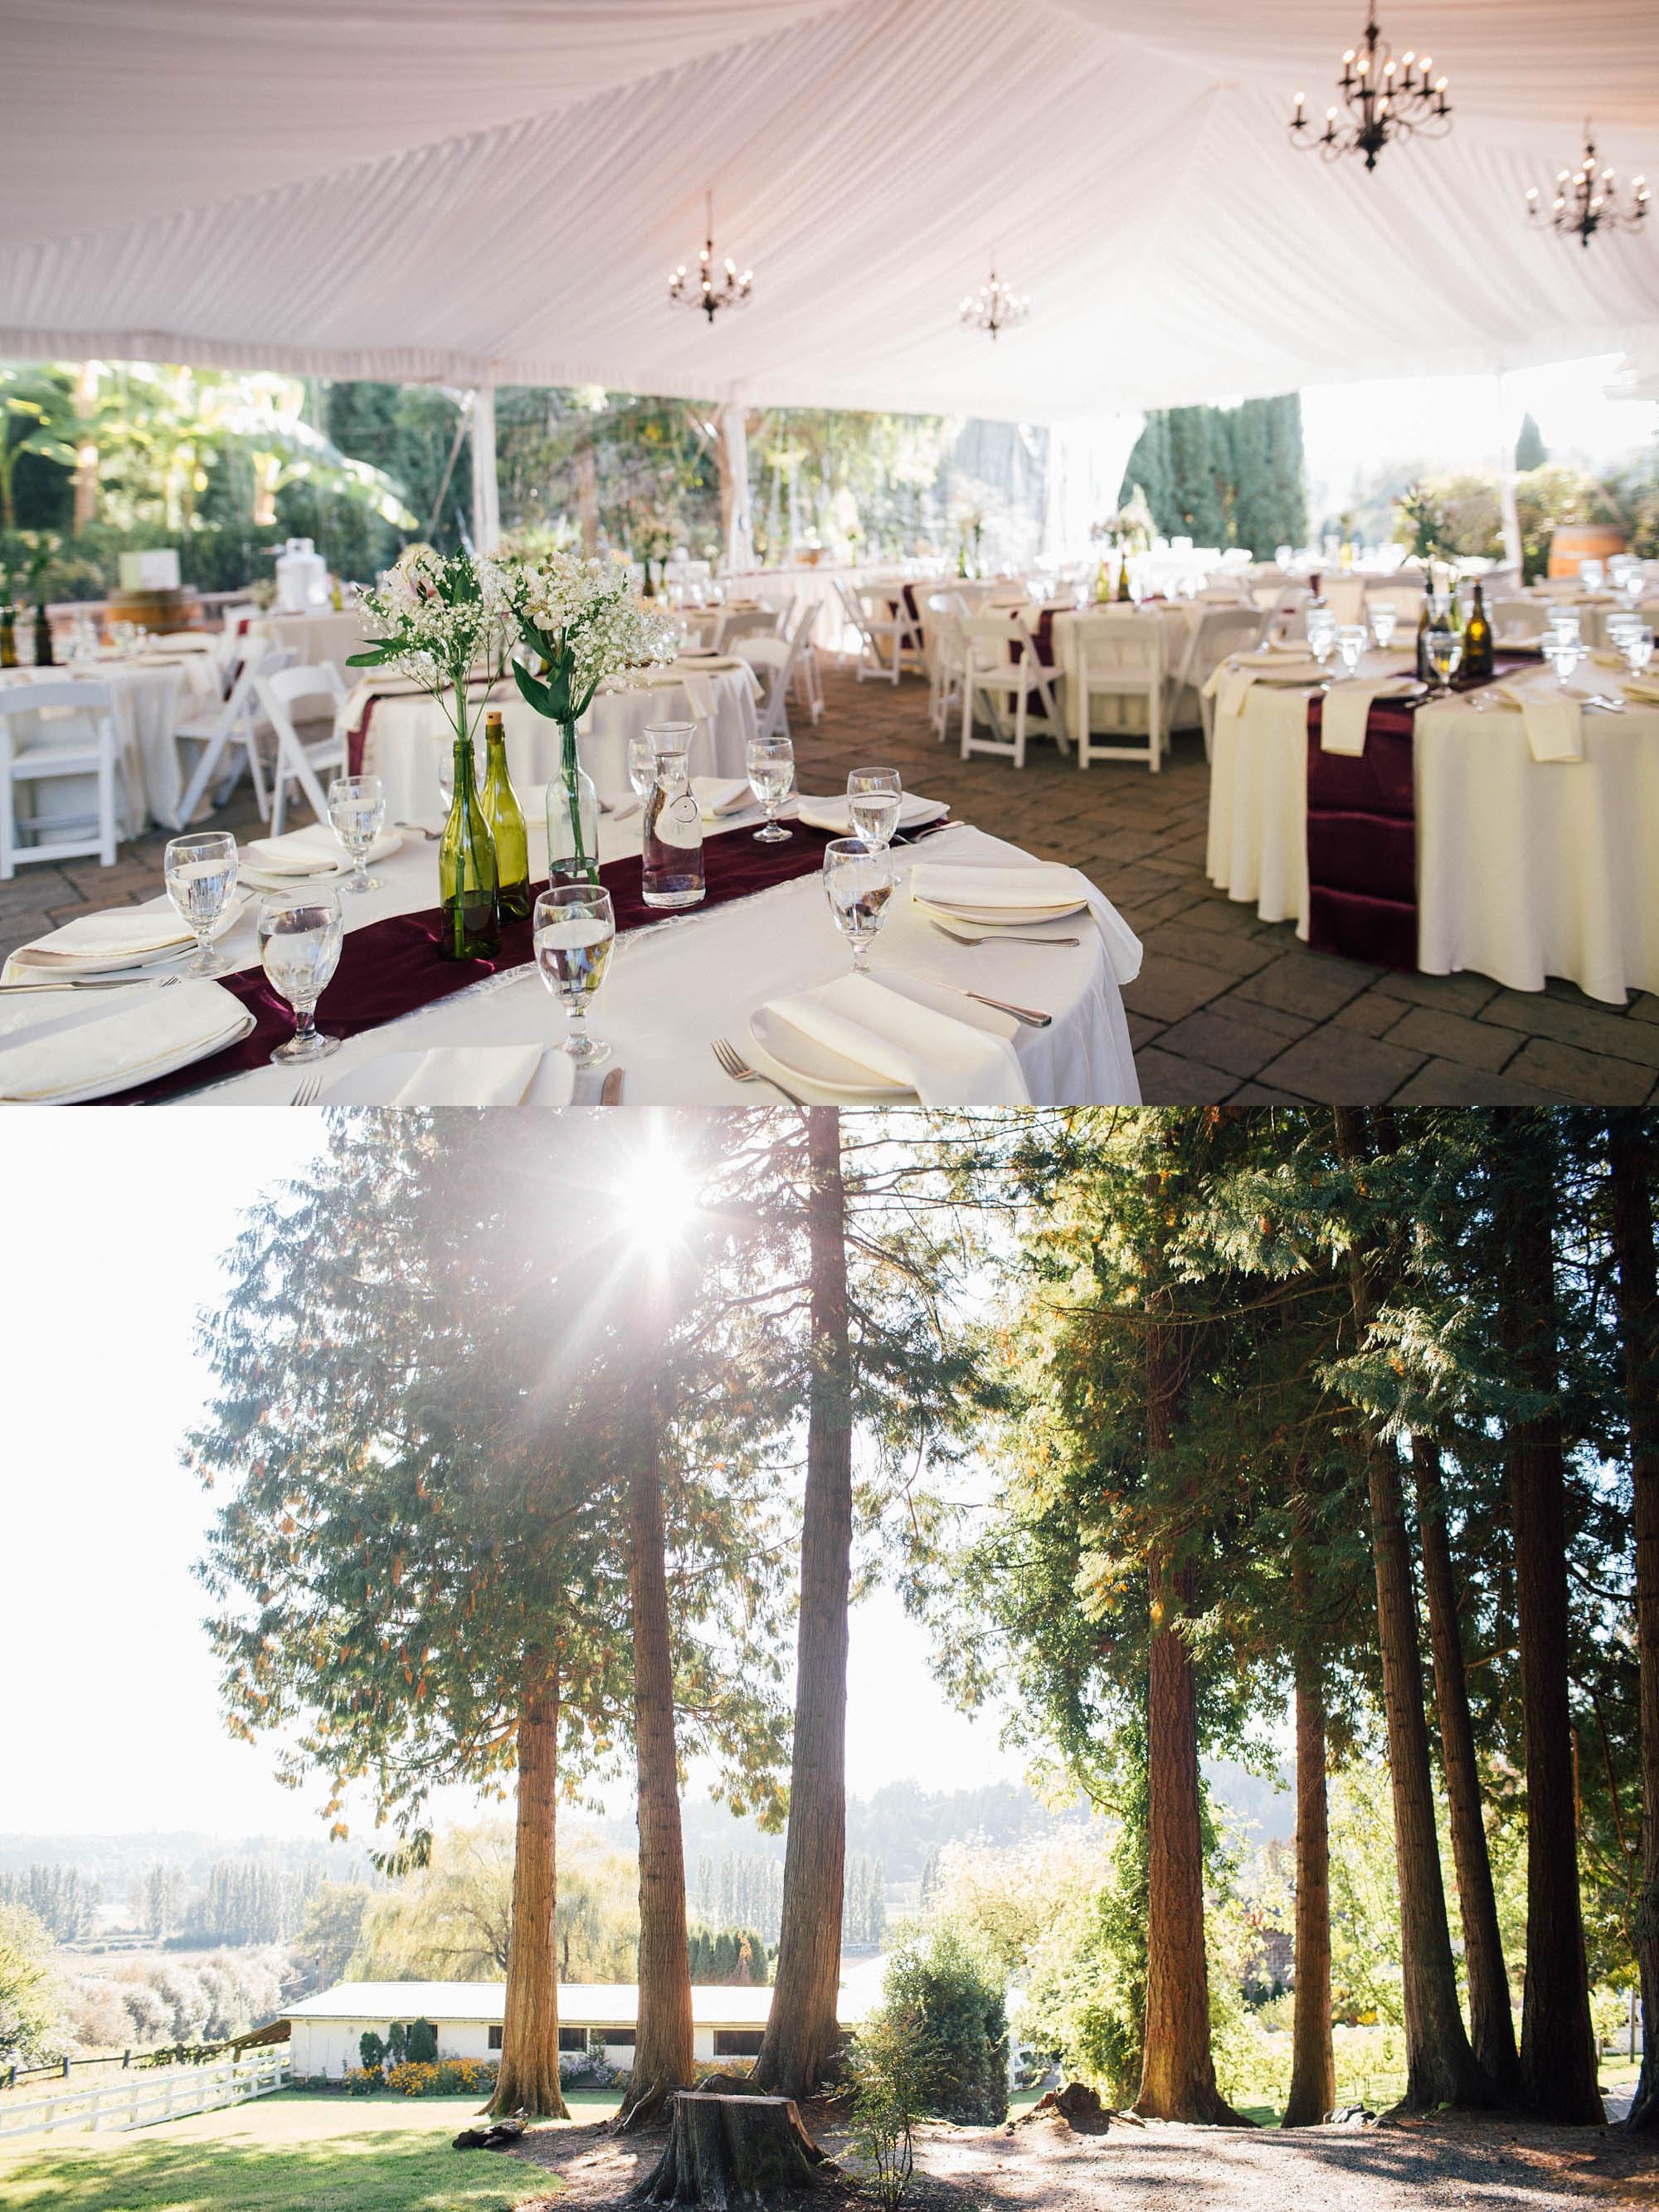 ashley_vos_seattle_ wedding_photographer_0184.jpg